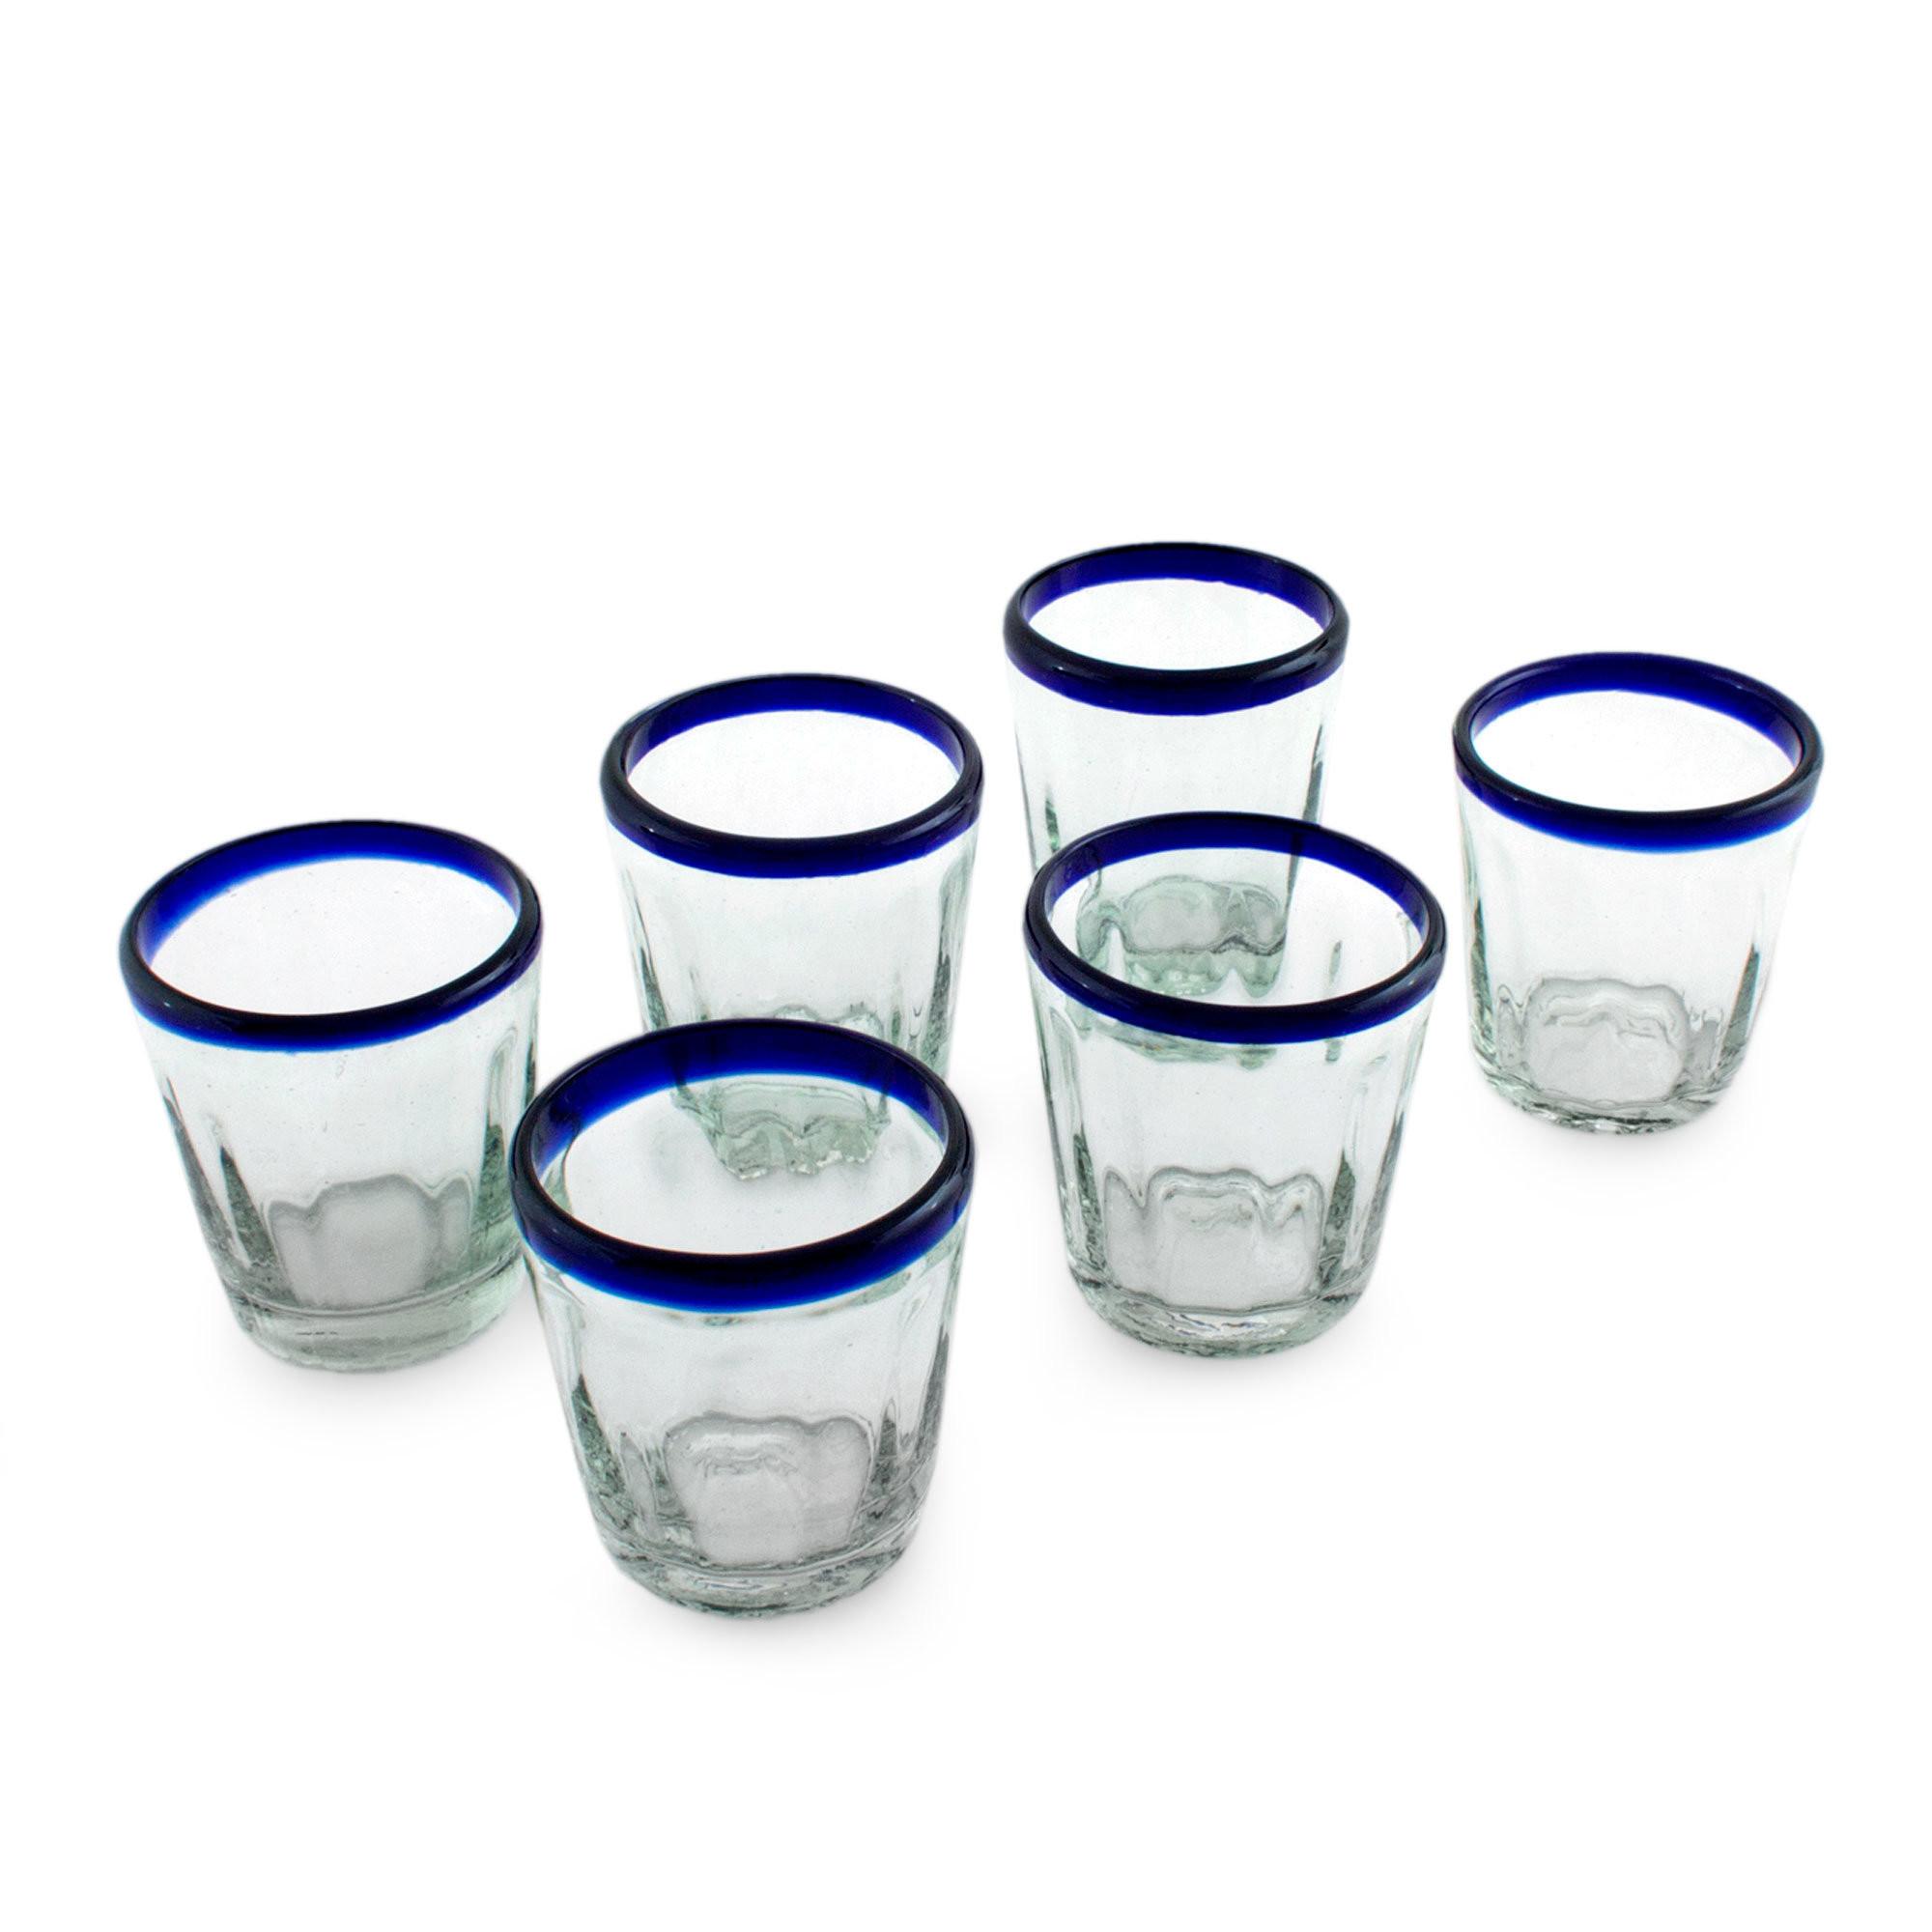 Set Of 3 Cylinder Glass Vases Of Novica Hand Blown 10 Oz Juice Glass Set Wayfair Inside Hand Blown 10 Oz Juice Glass Set